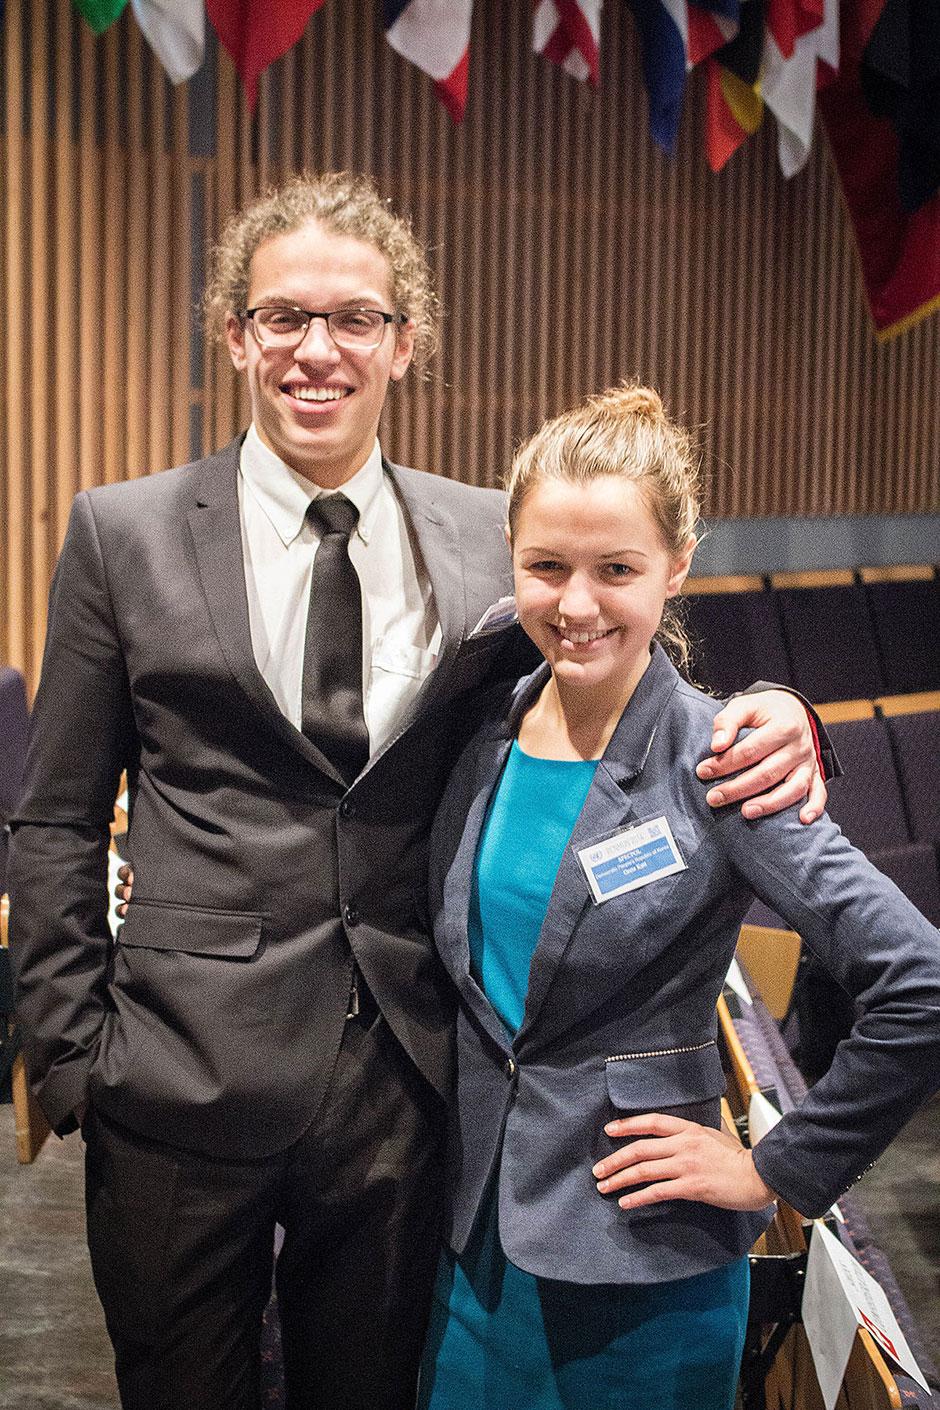 MUN delegates Jonas (Denmark) and Grete (Latvia)